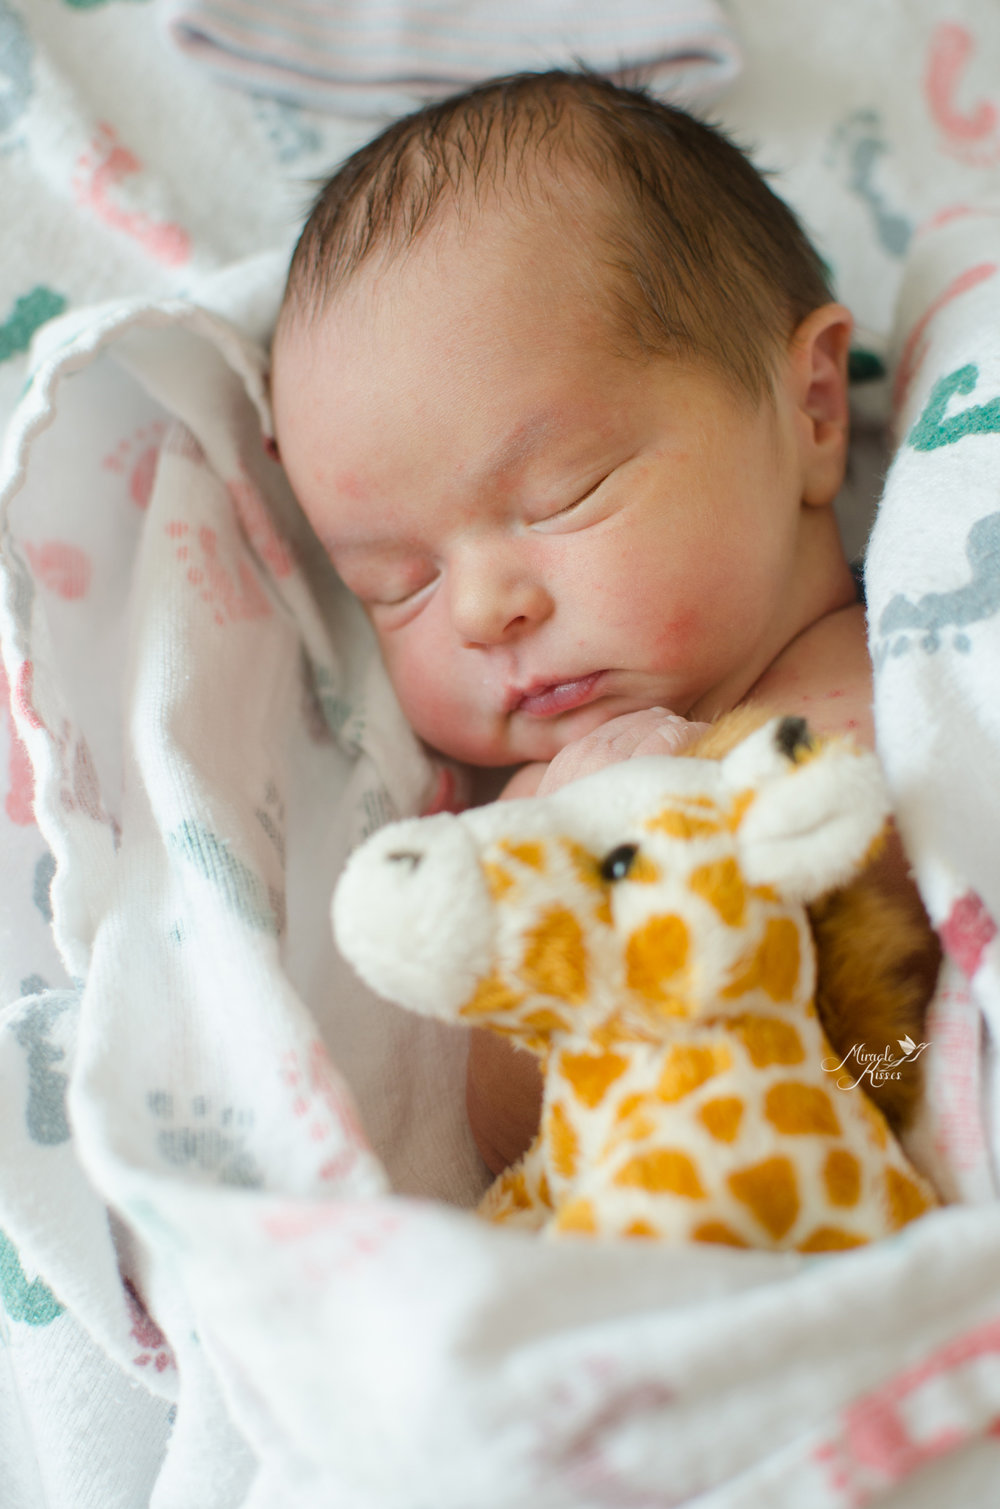 newborn photography in hospital, fresh 48 session, sentimental photos